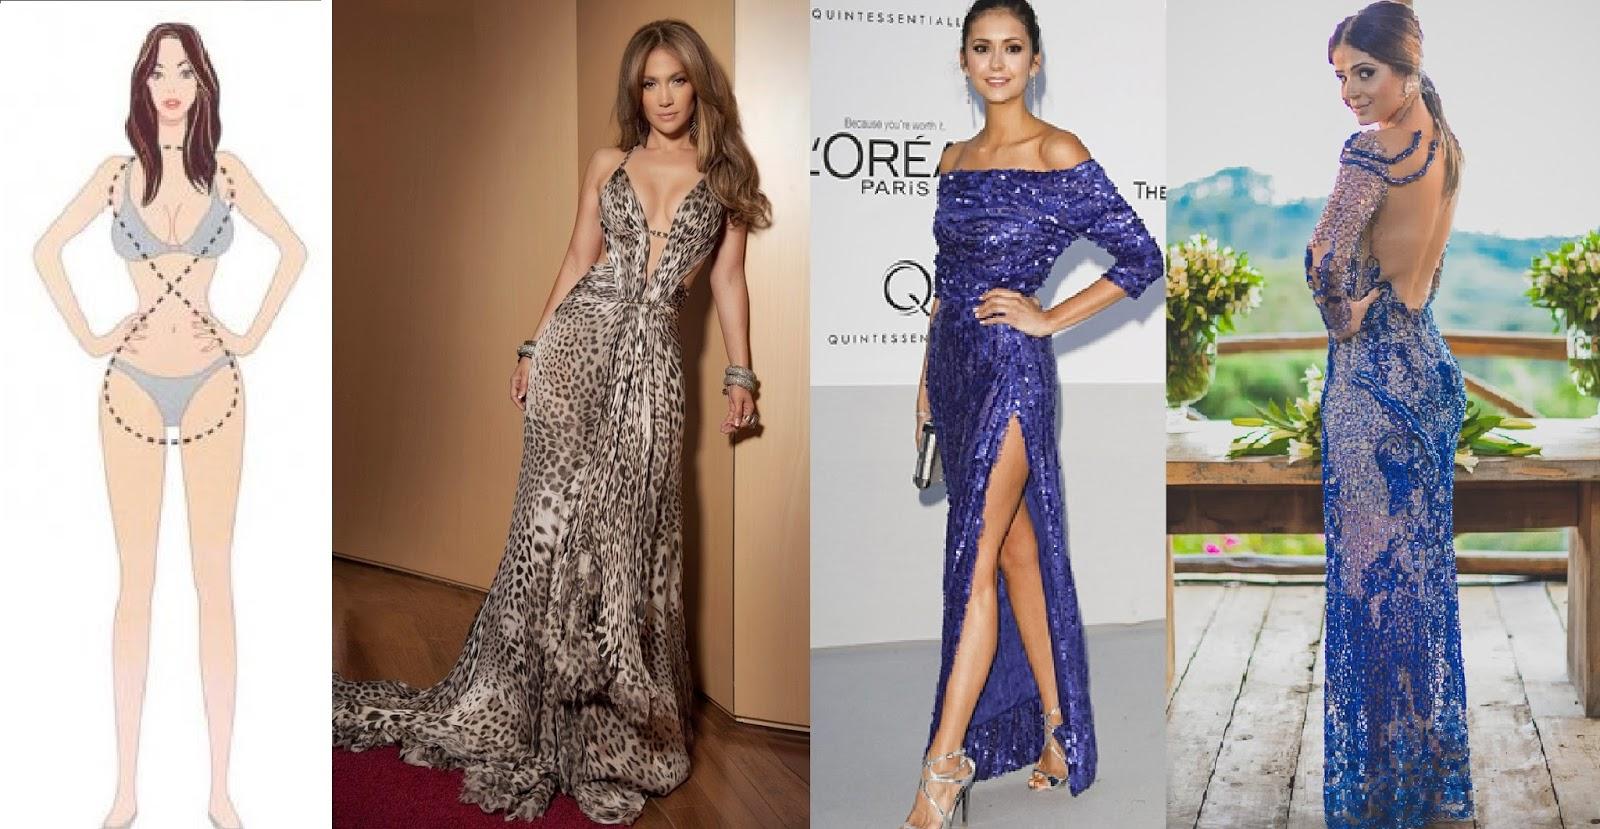 Amando Super Blog de Moda Ribeirao Preto Como escolher vestido de festa para corpo tipo ampulheta